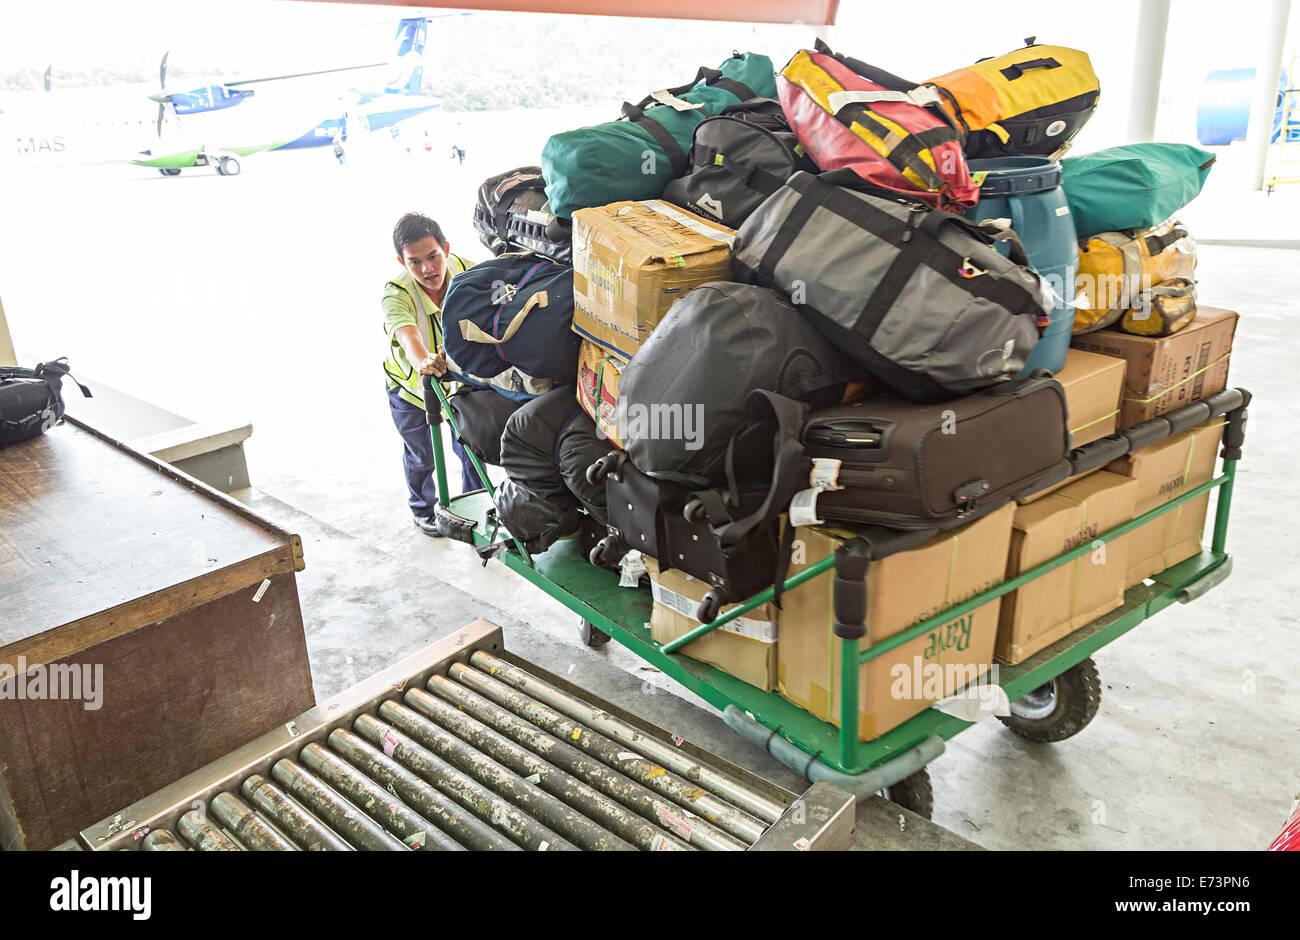 Baggage handling at airport, Mulu, Malaysia - Stock Image